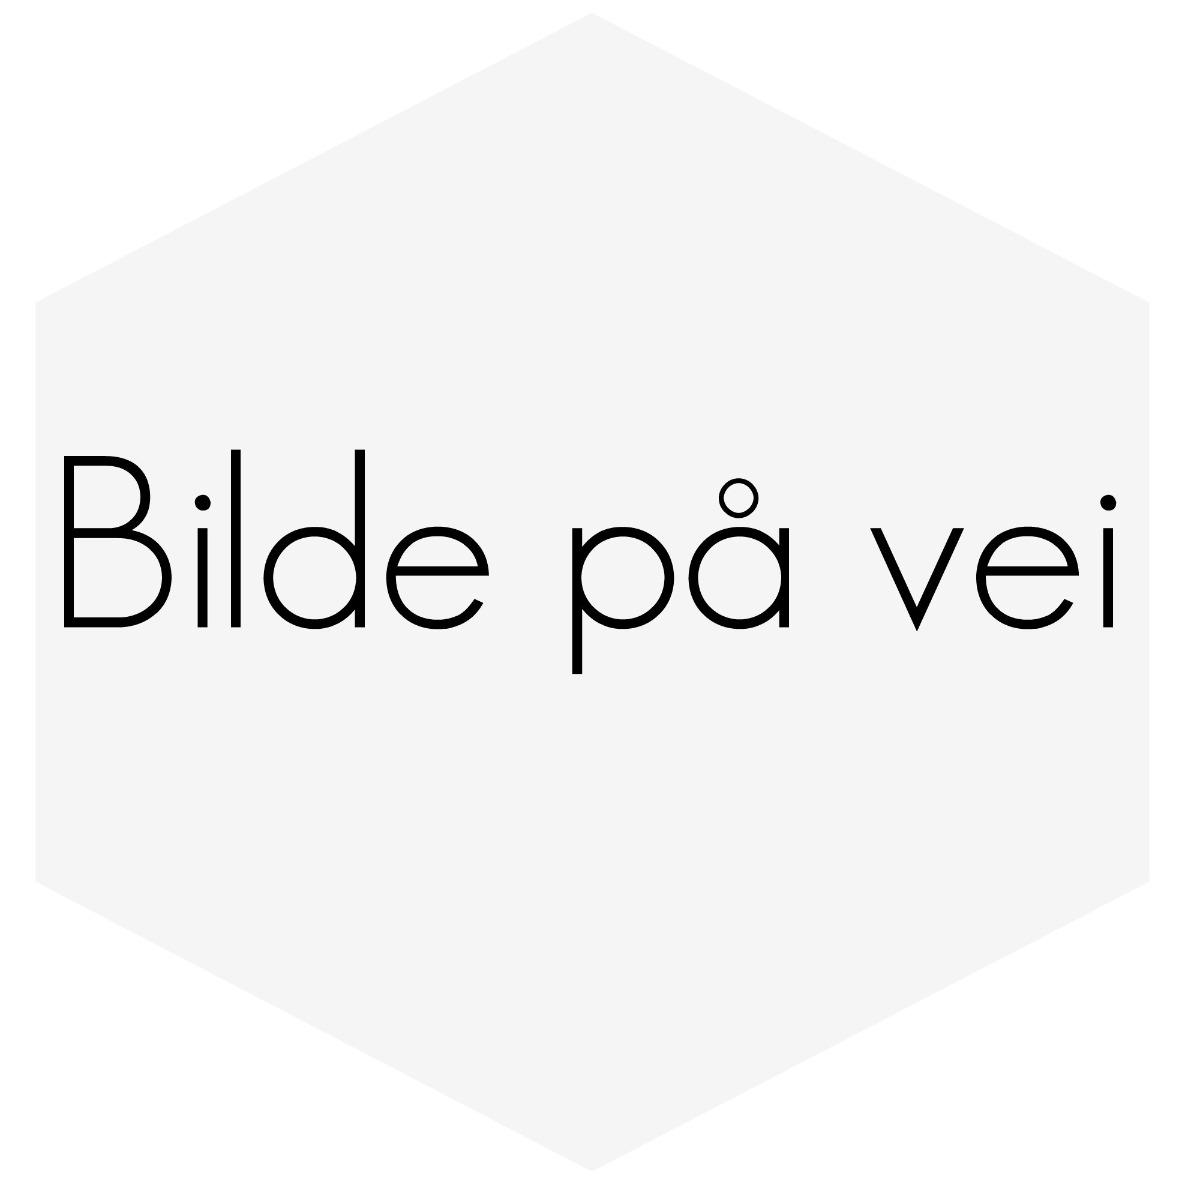 "SILIKONSLANGE RØD REDUSERING 2-2,75"" (51-70MM)"